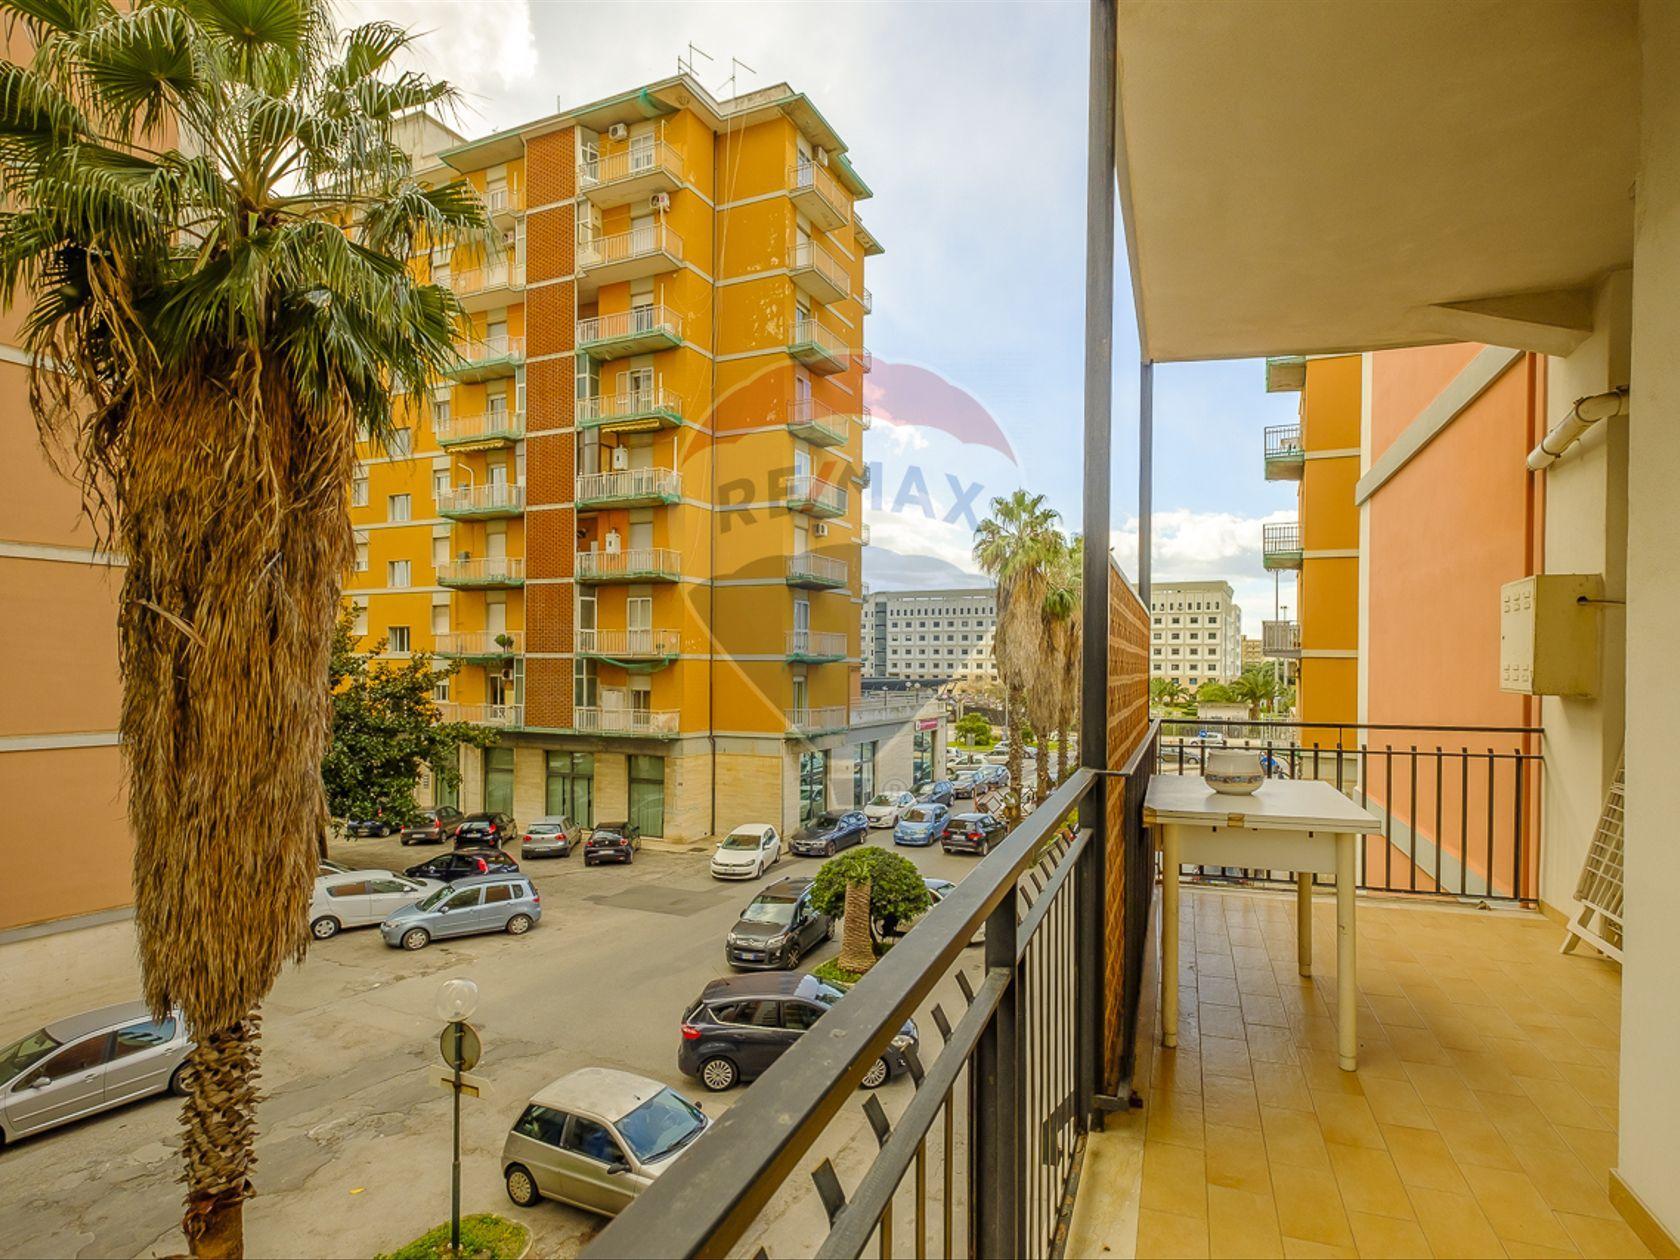 Appartamento Siracusa- Scala Greca S. Panagia Teracati Zecchino, Siracusa, SR Vendita - Foto 19